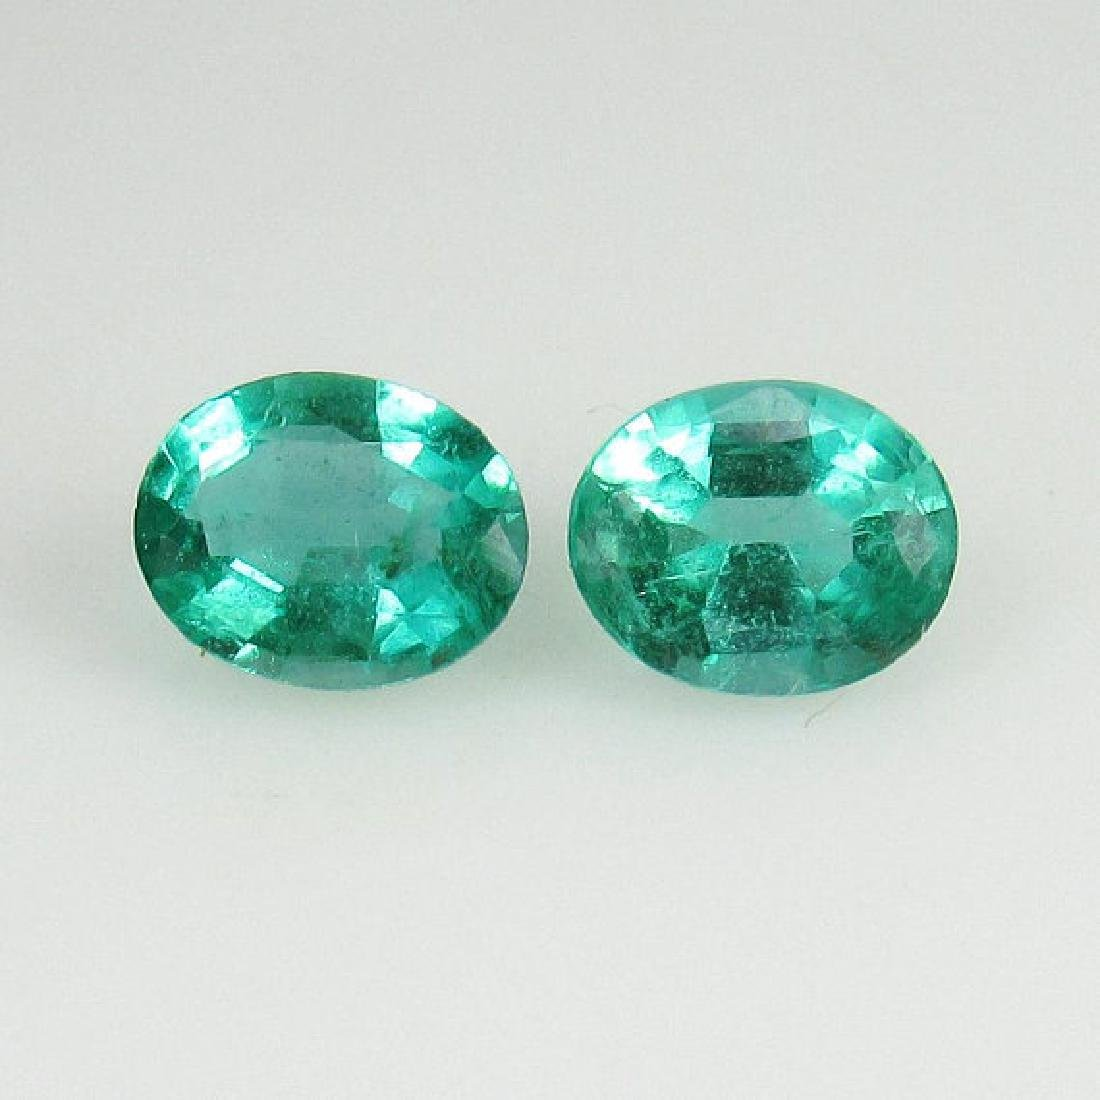 0.75 Ct IGI Certified Genuine Zambian Emerald Matching